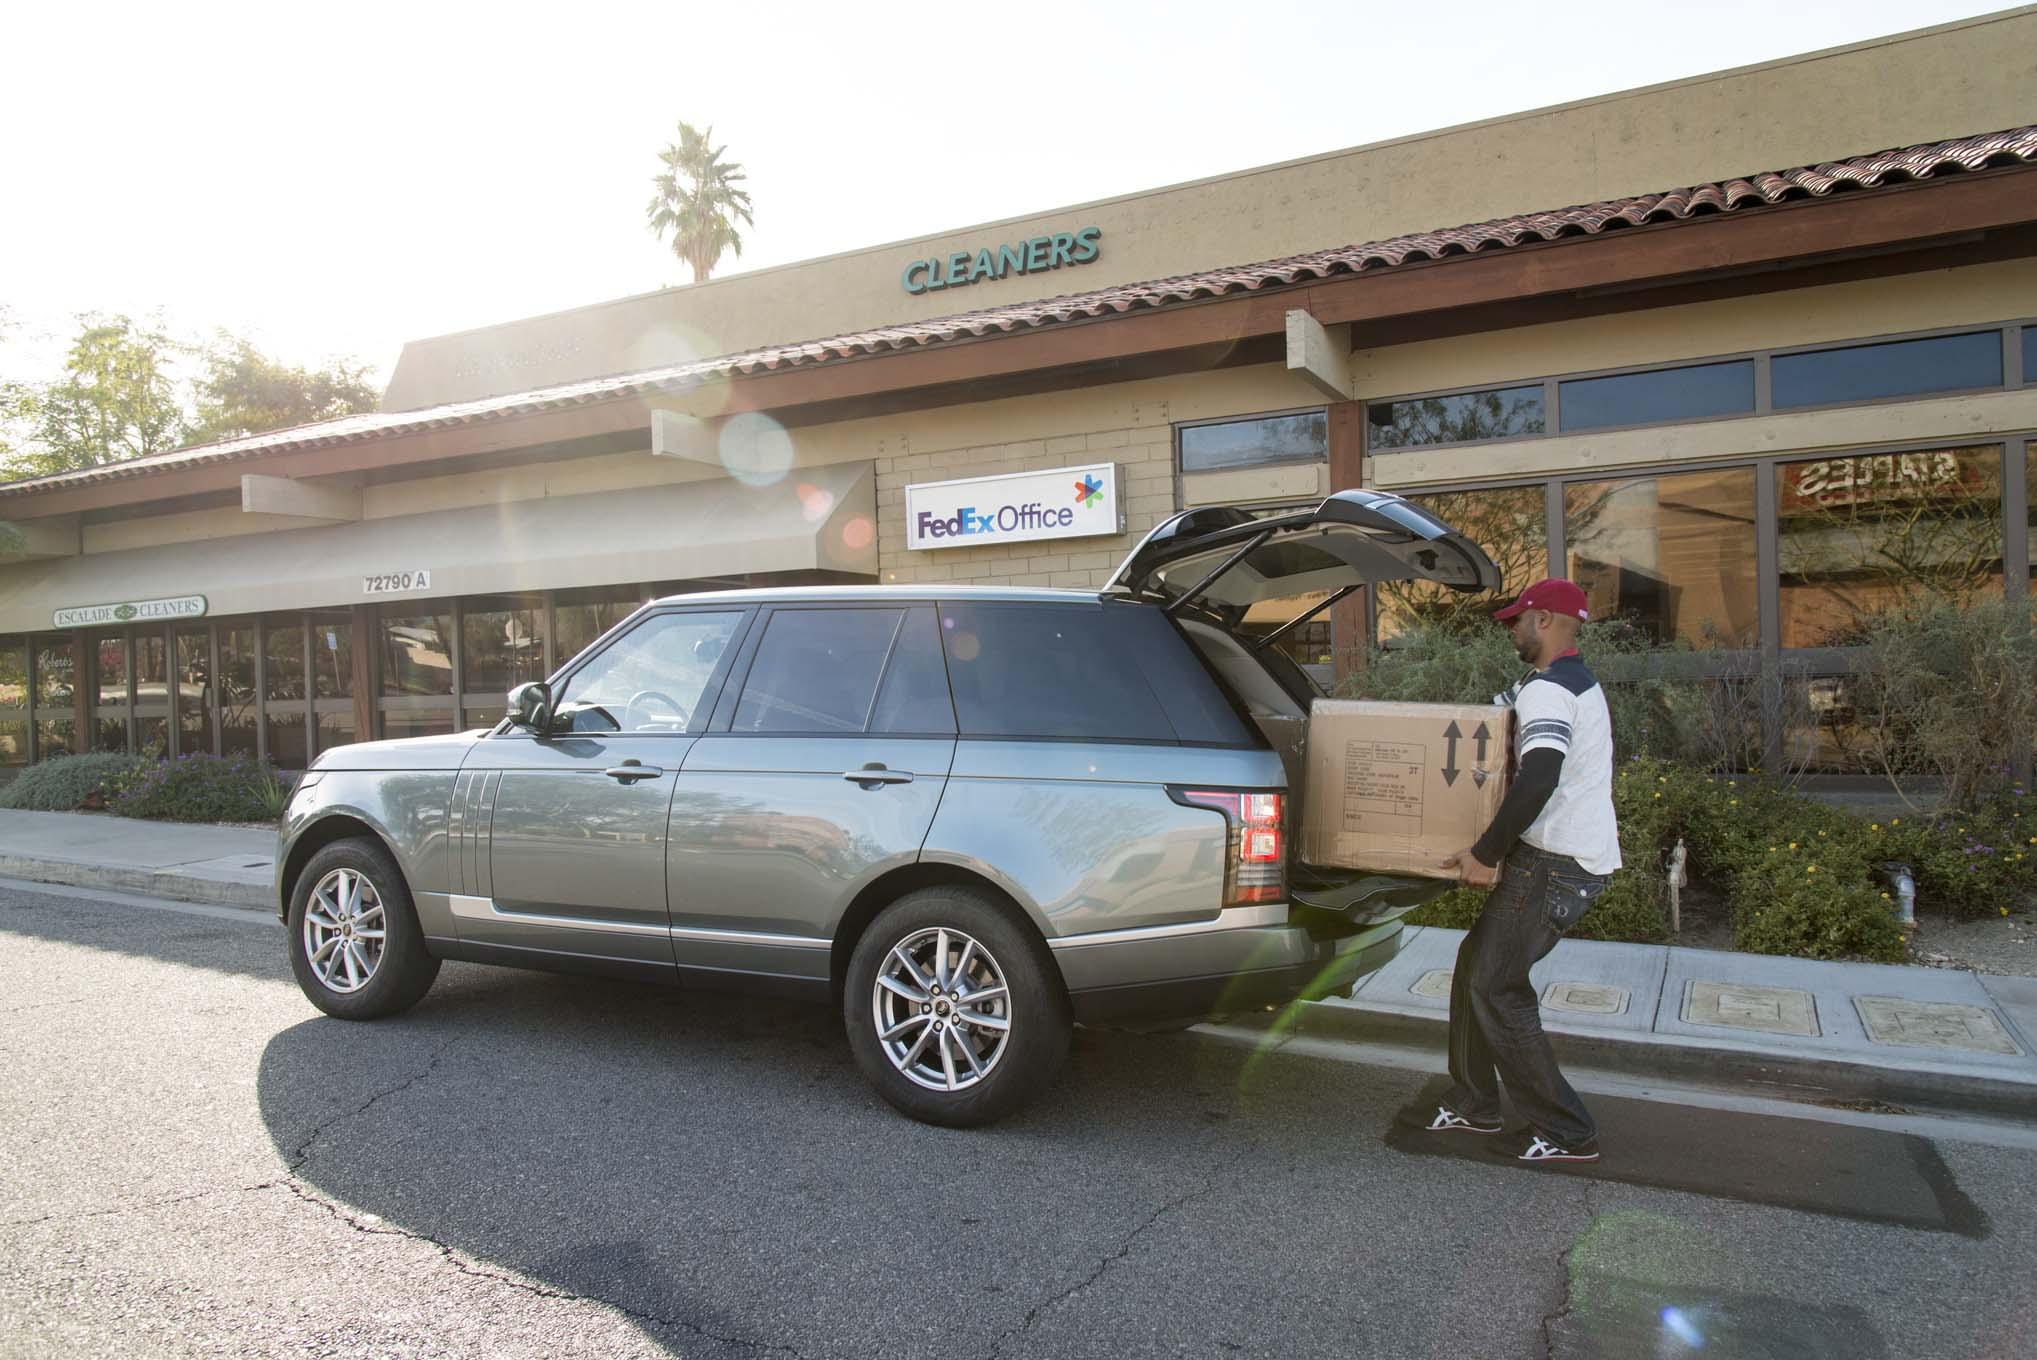 2014 Range Rover Autobiography Long Wheelbase: Around The Block